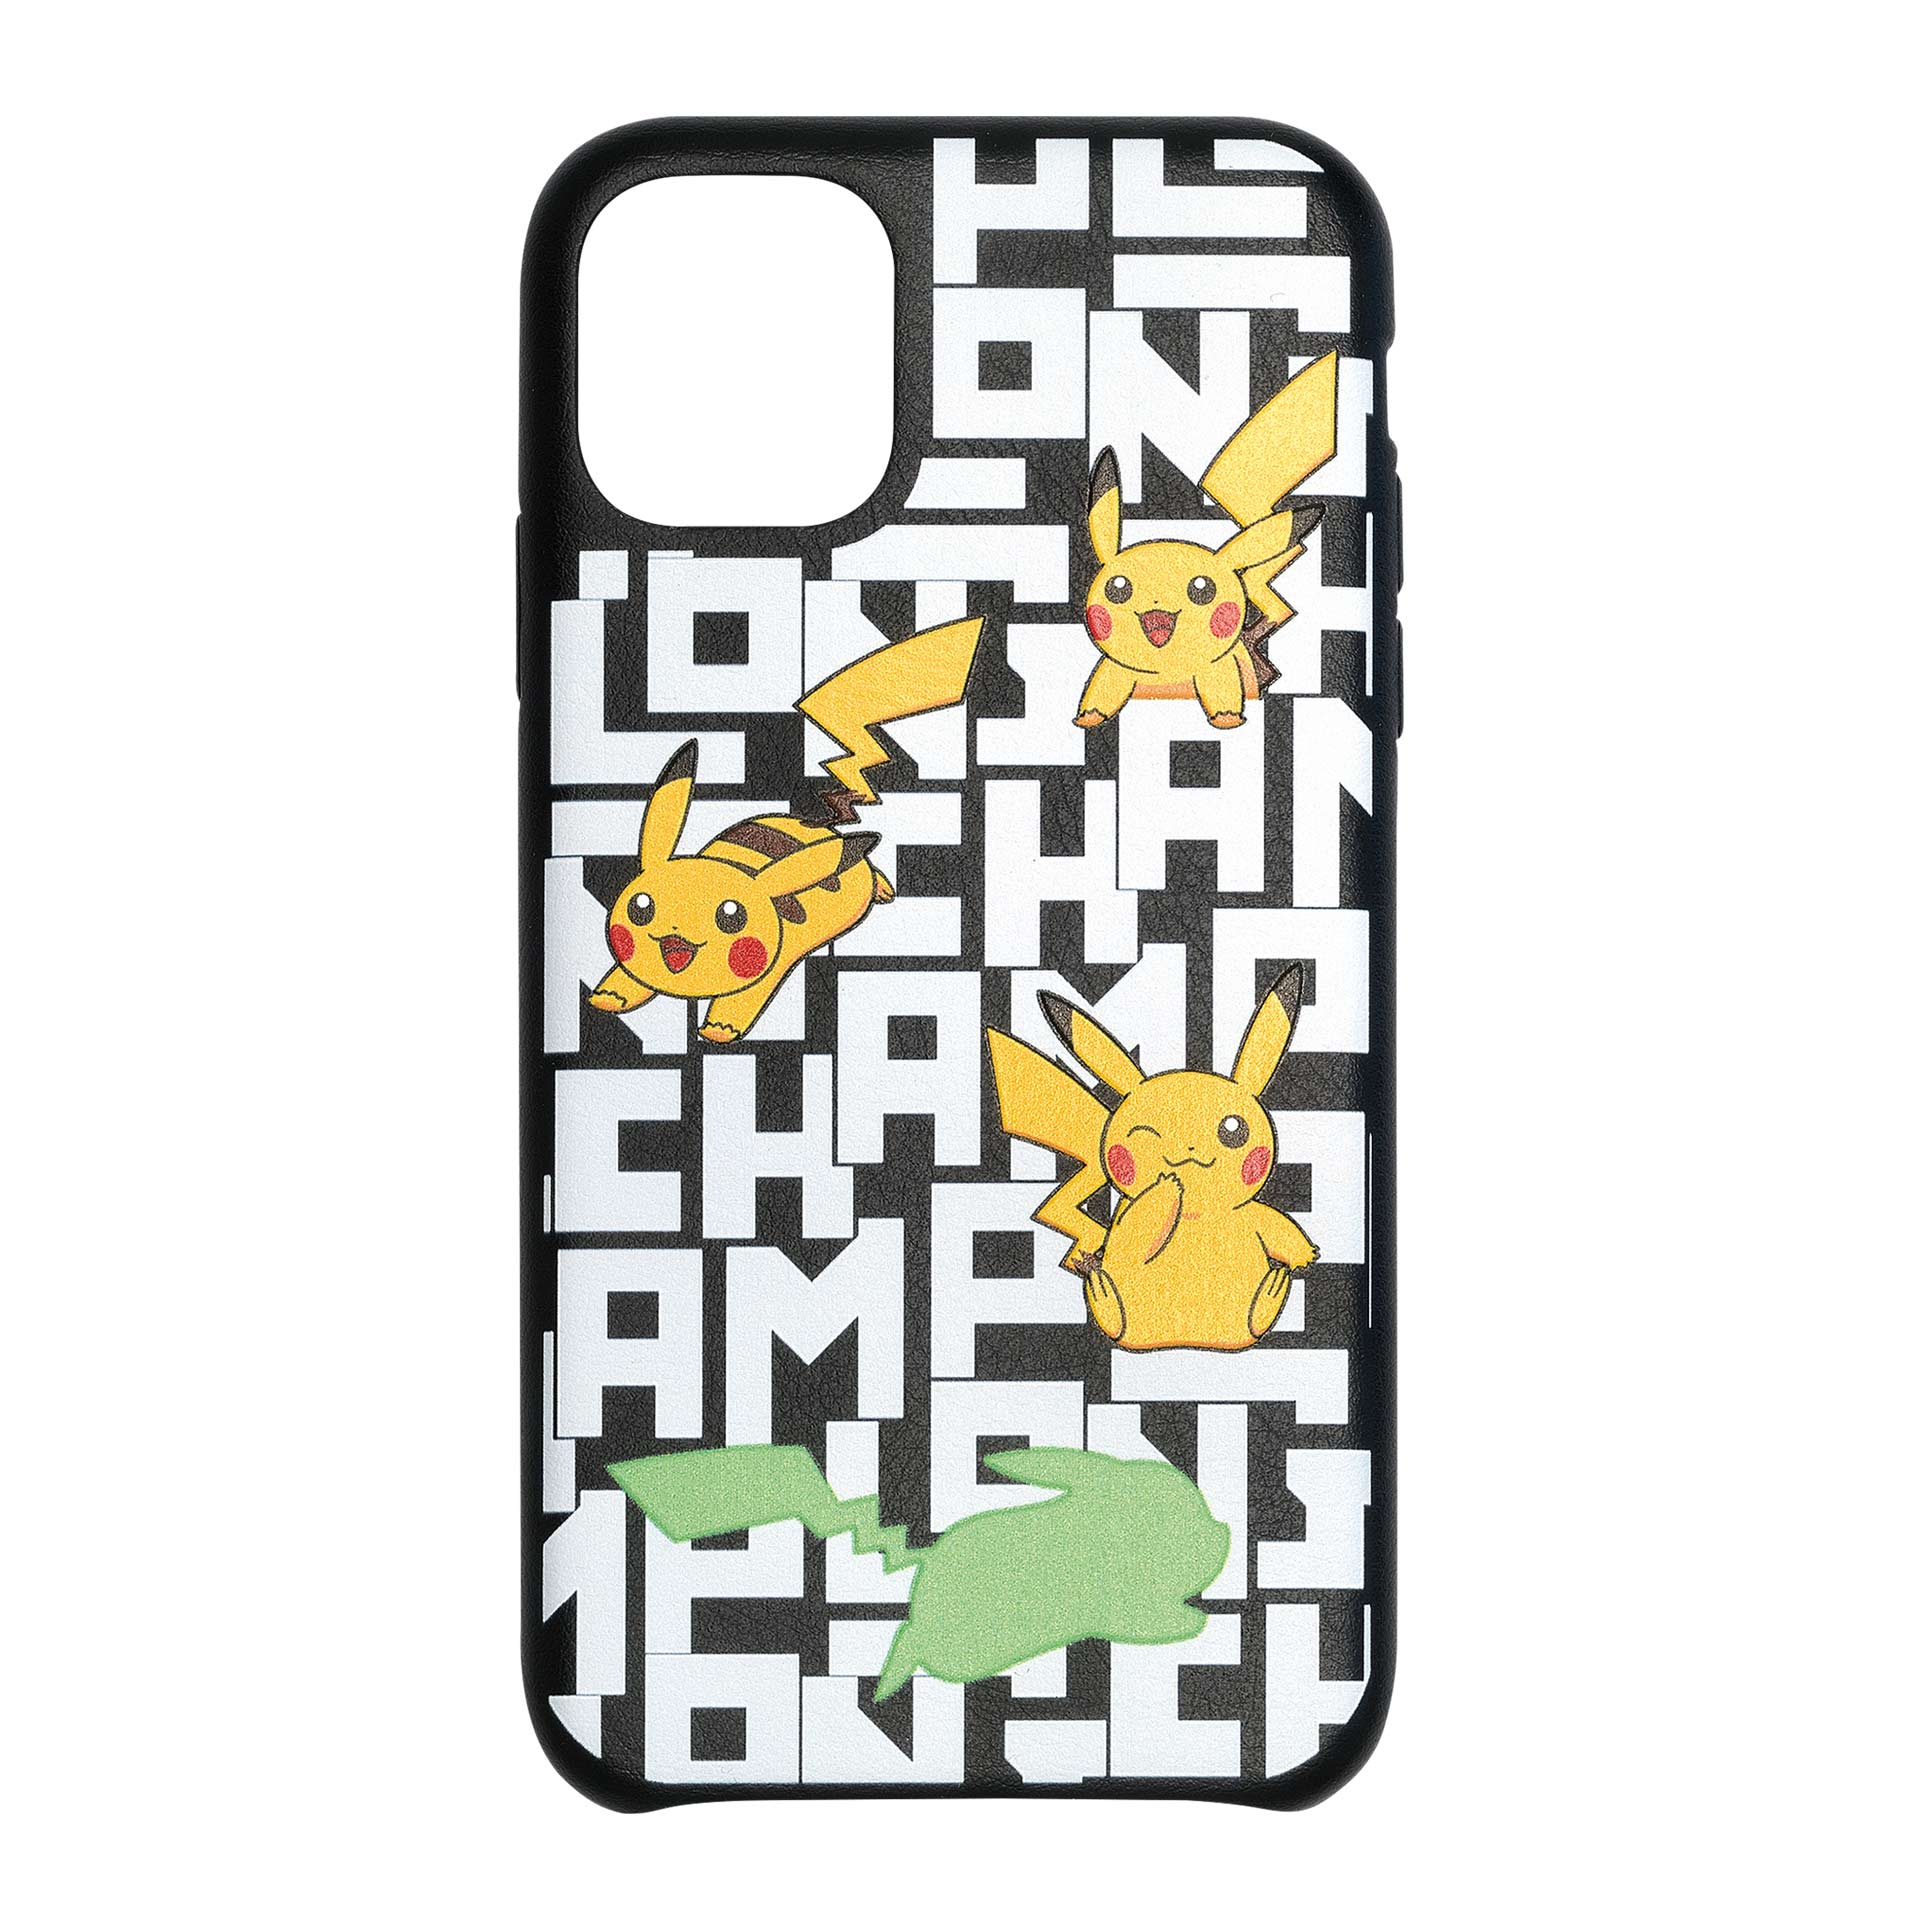 Le Pliage Pokemon Iphone 11 Case black/white